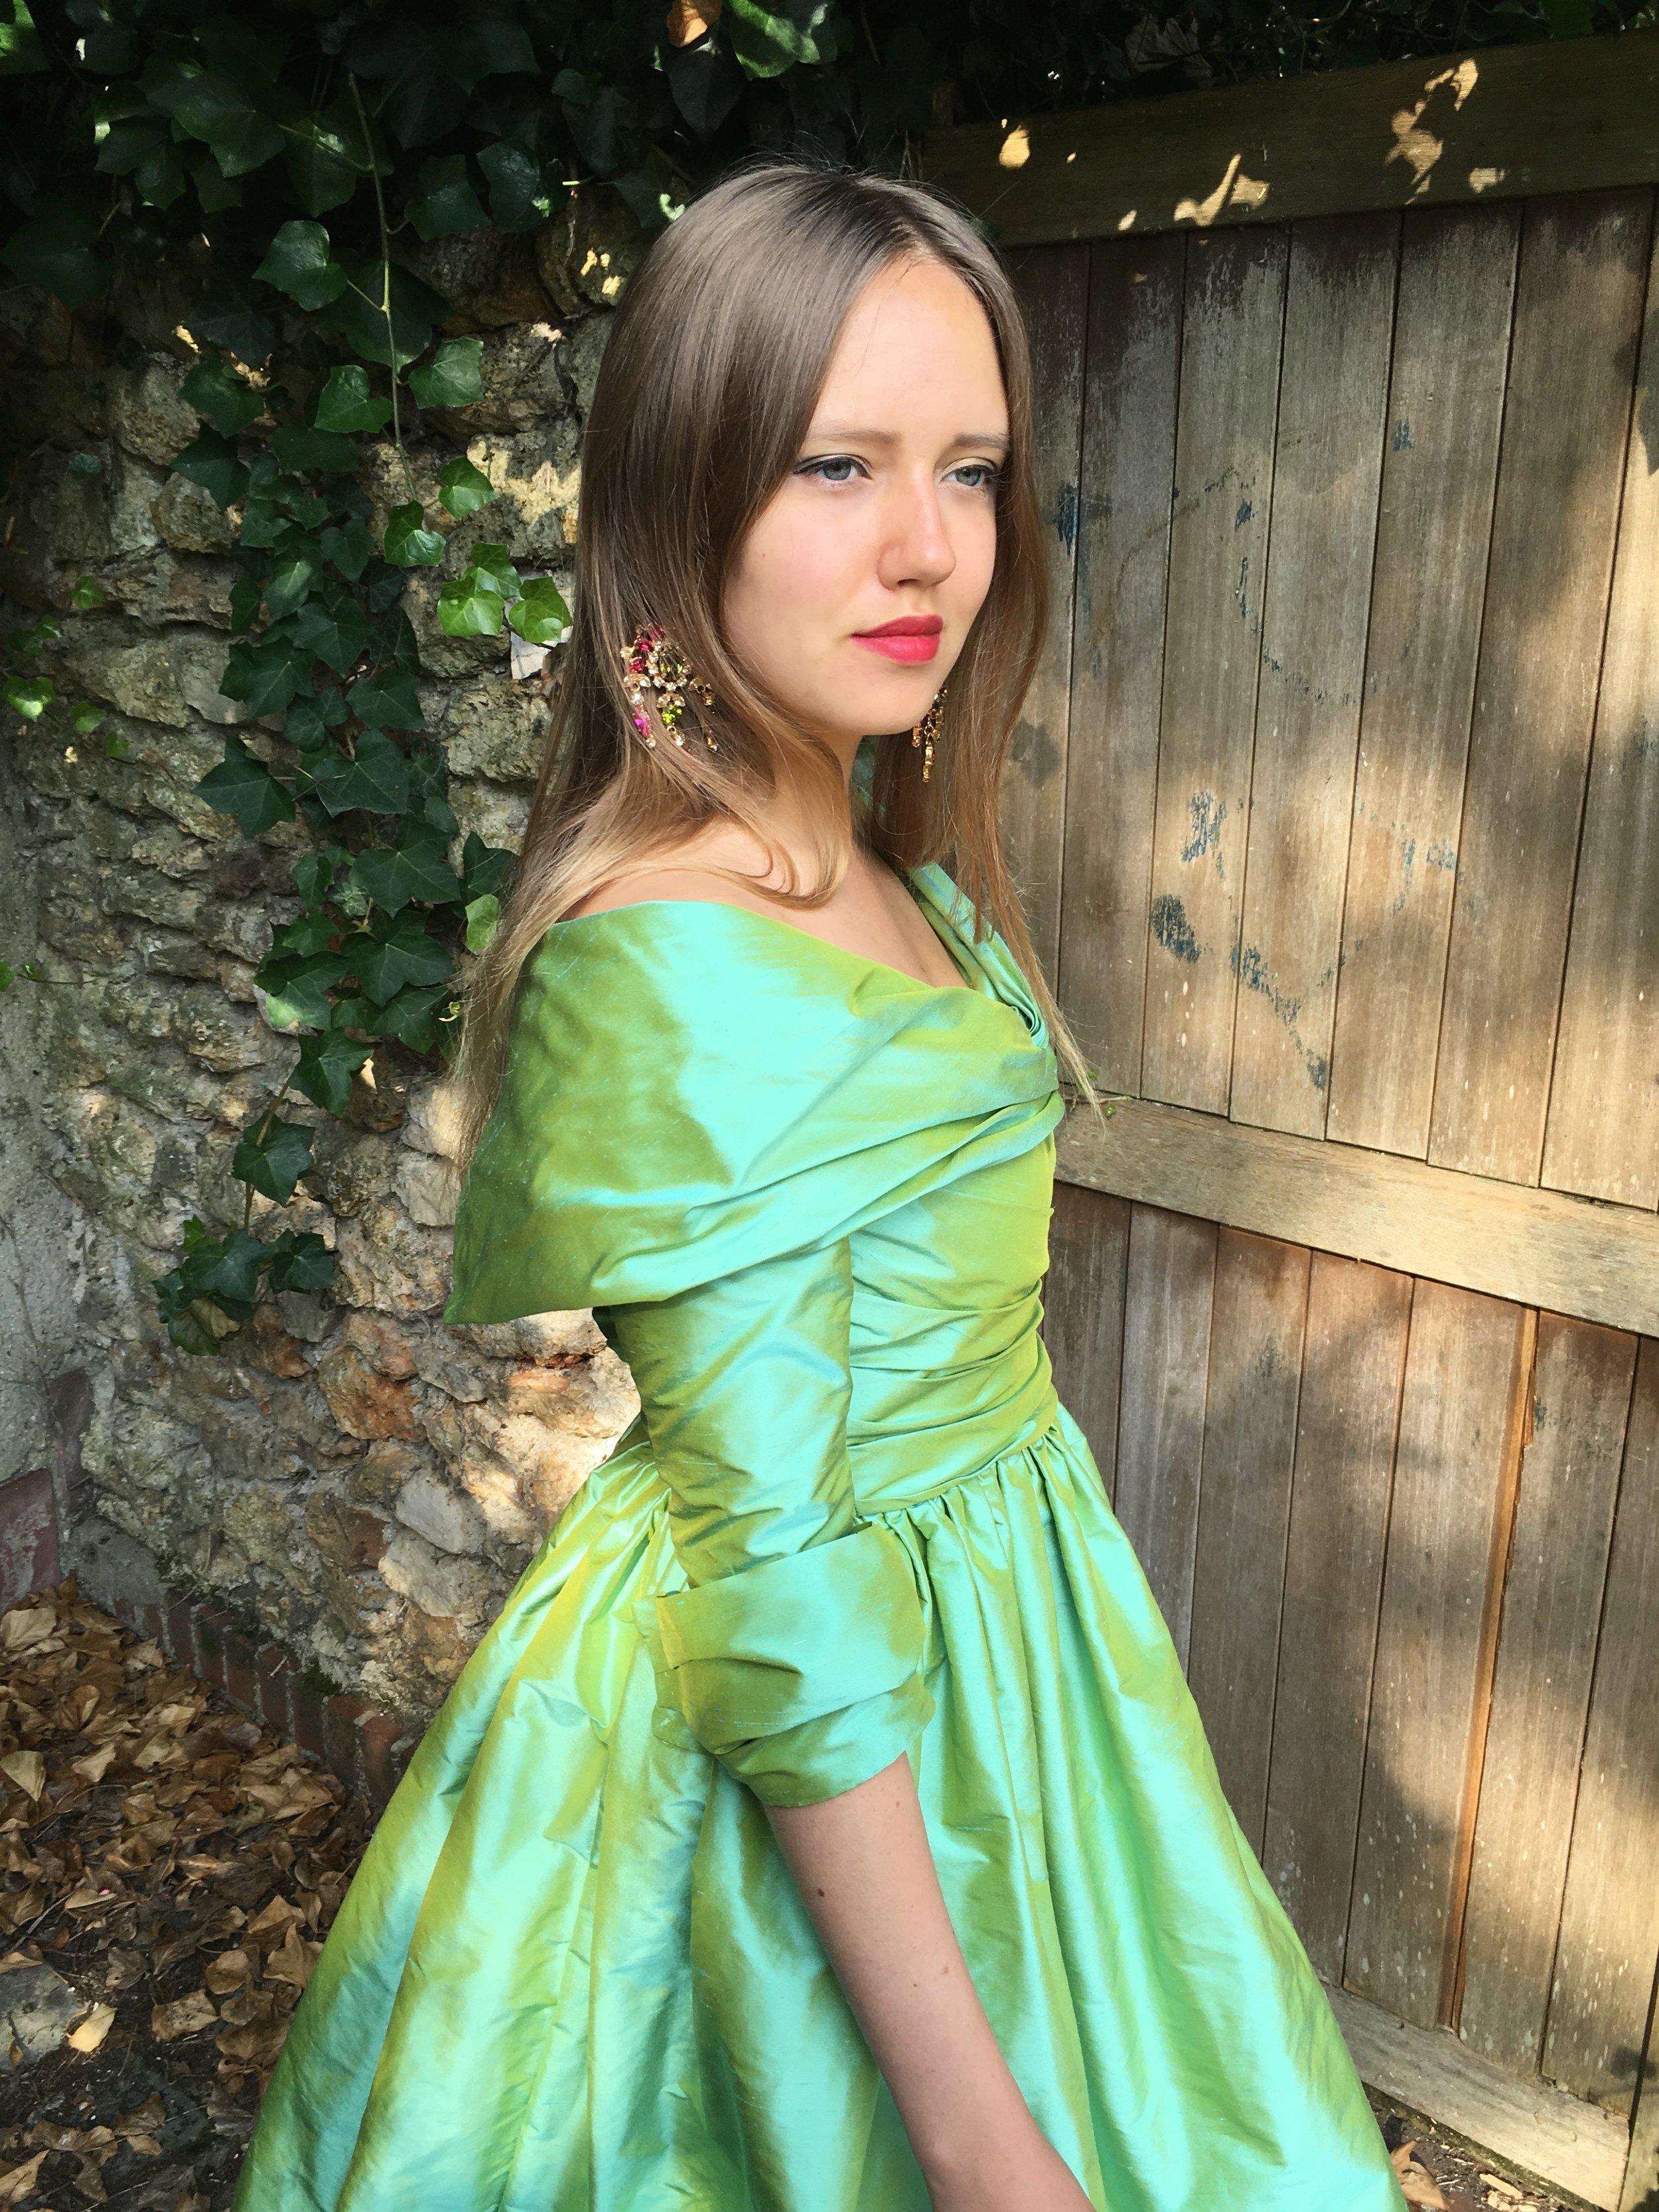 Robe de cocktail en soie verte drapée Agnes Szabelewski profil.jpg